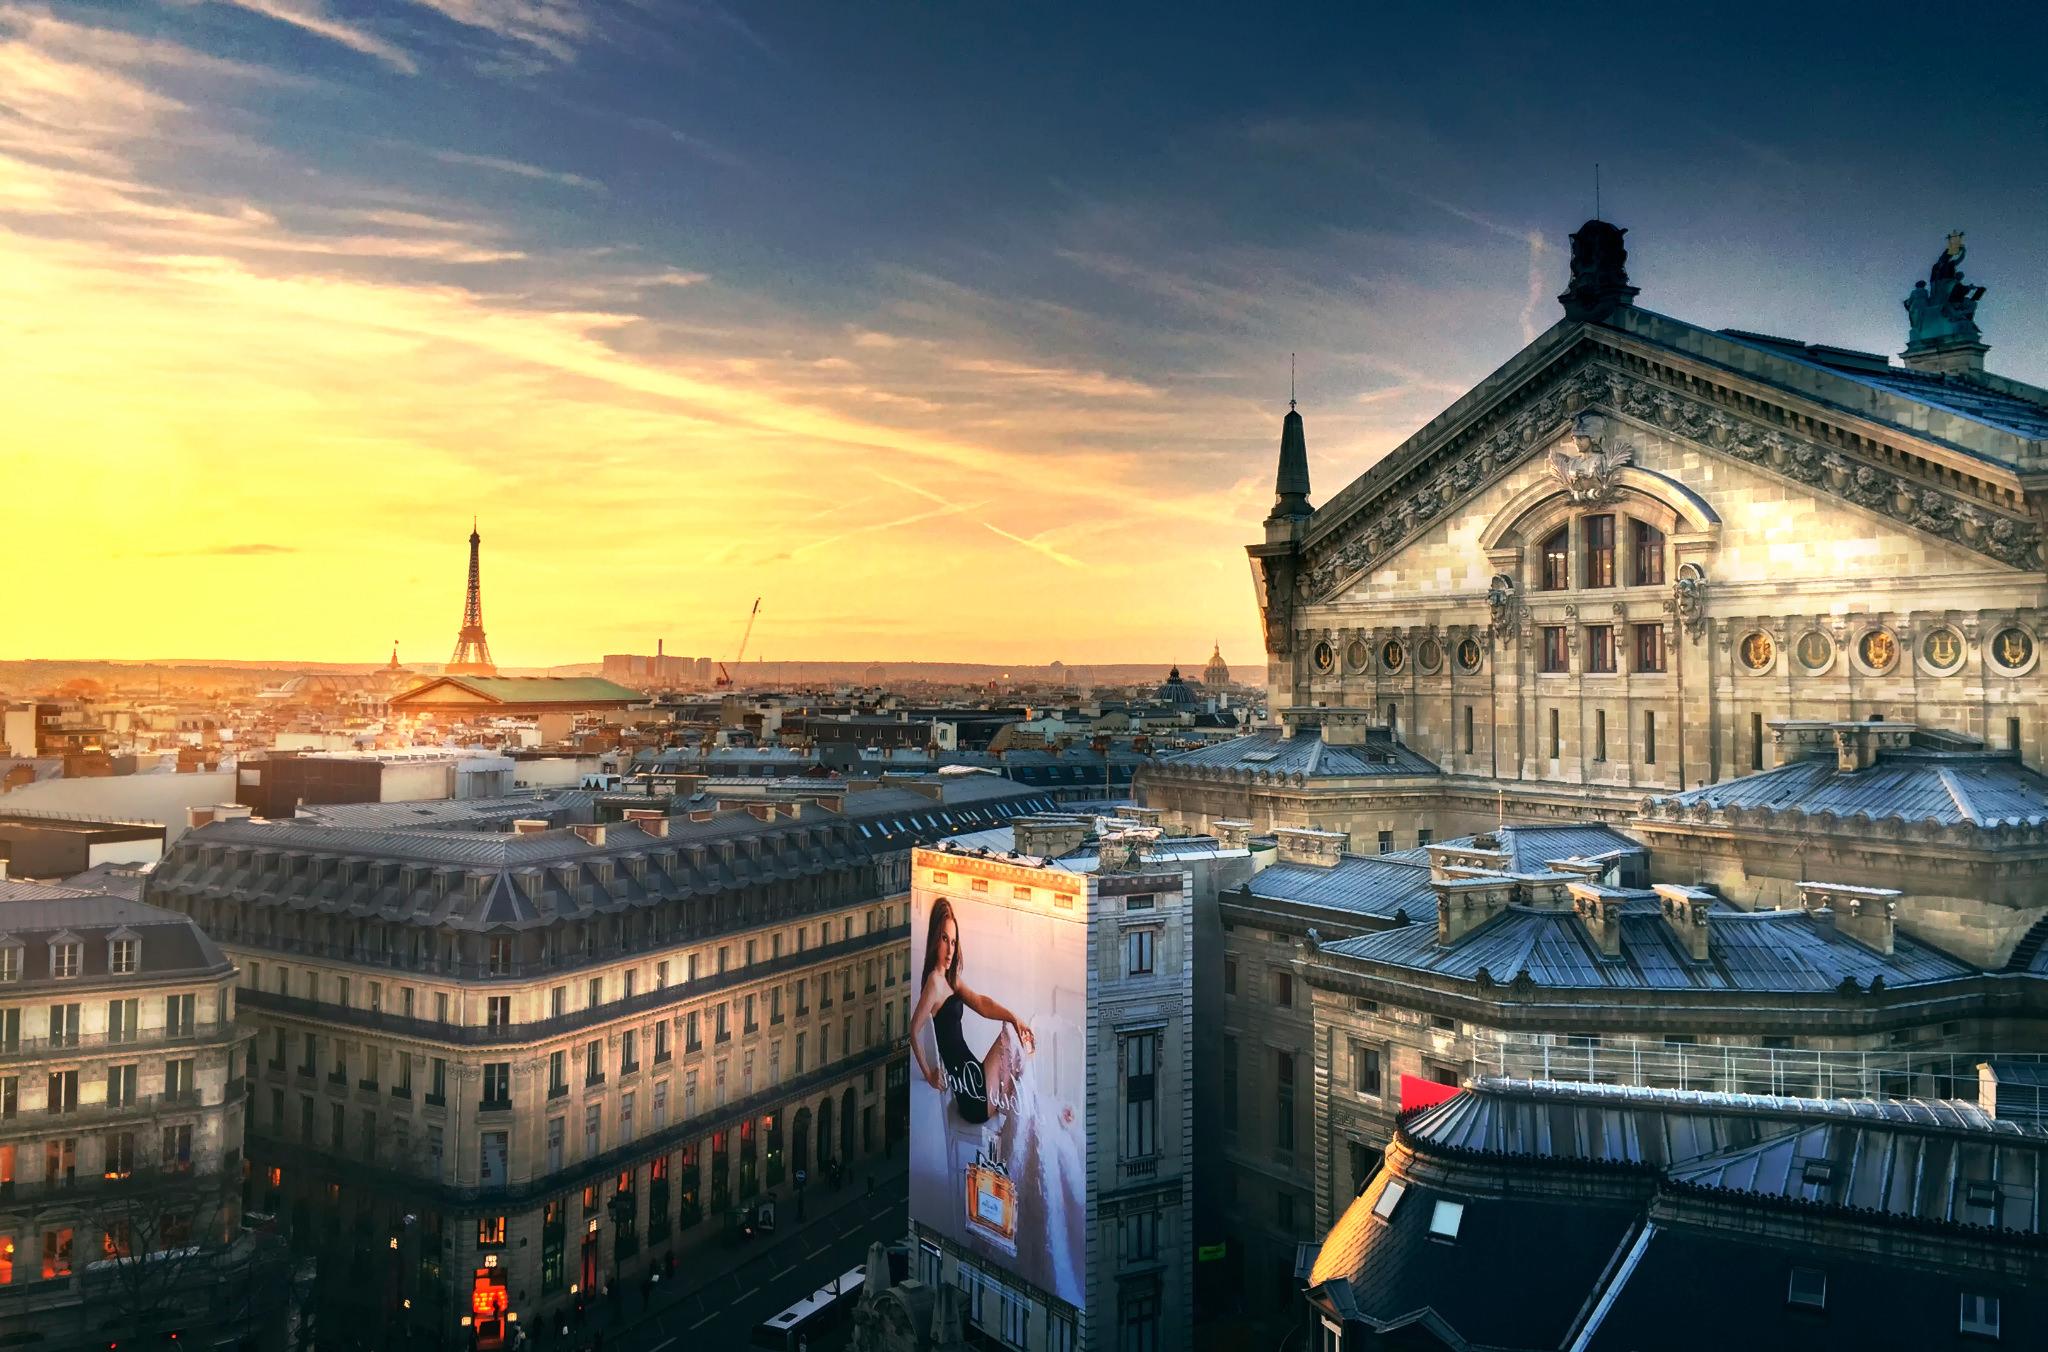 Opera Eiffel Tower Cityscape Classy Wallpaper